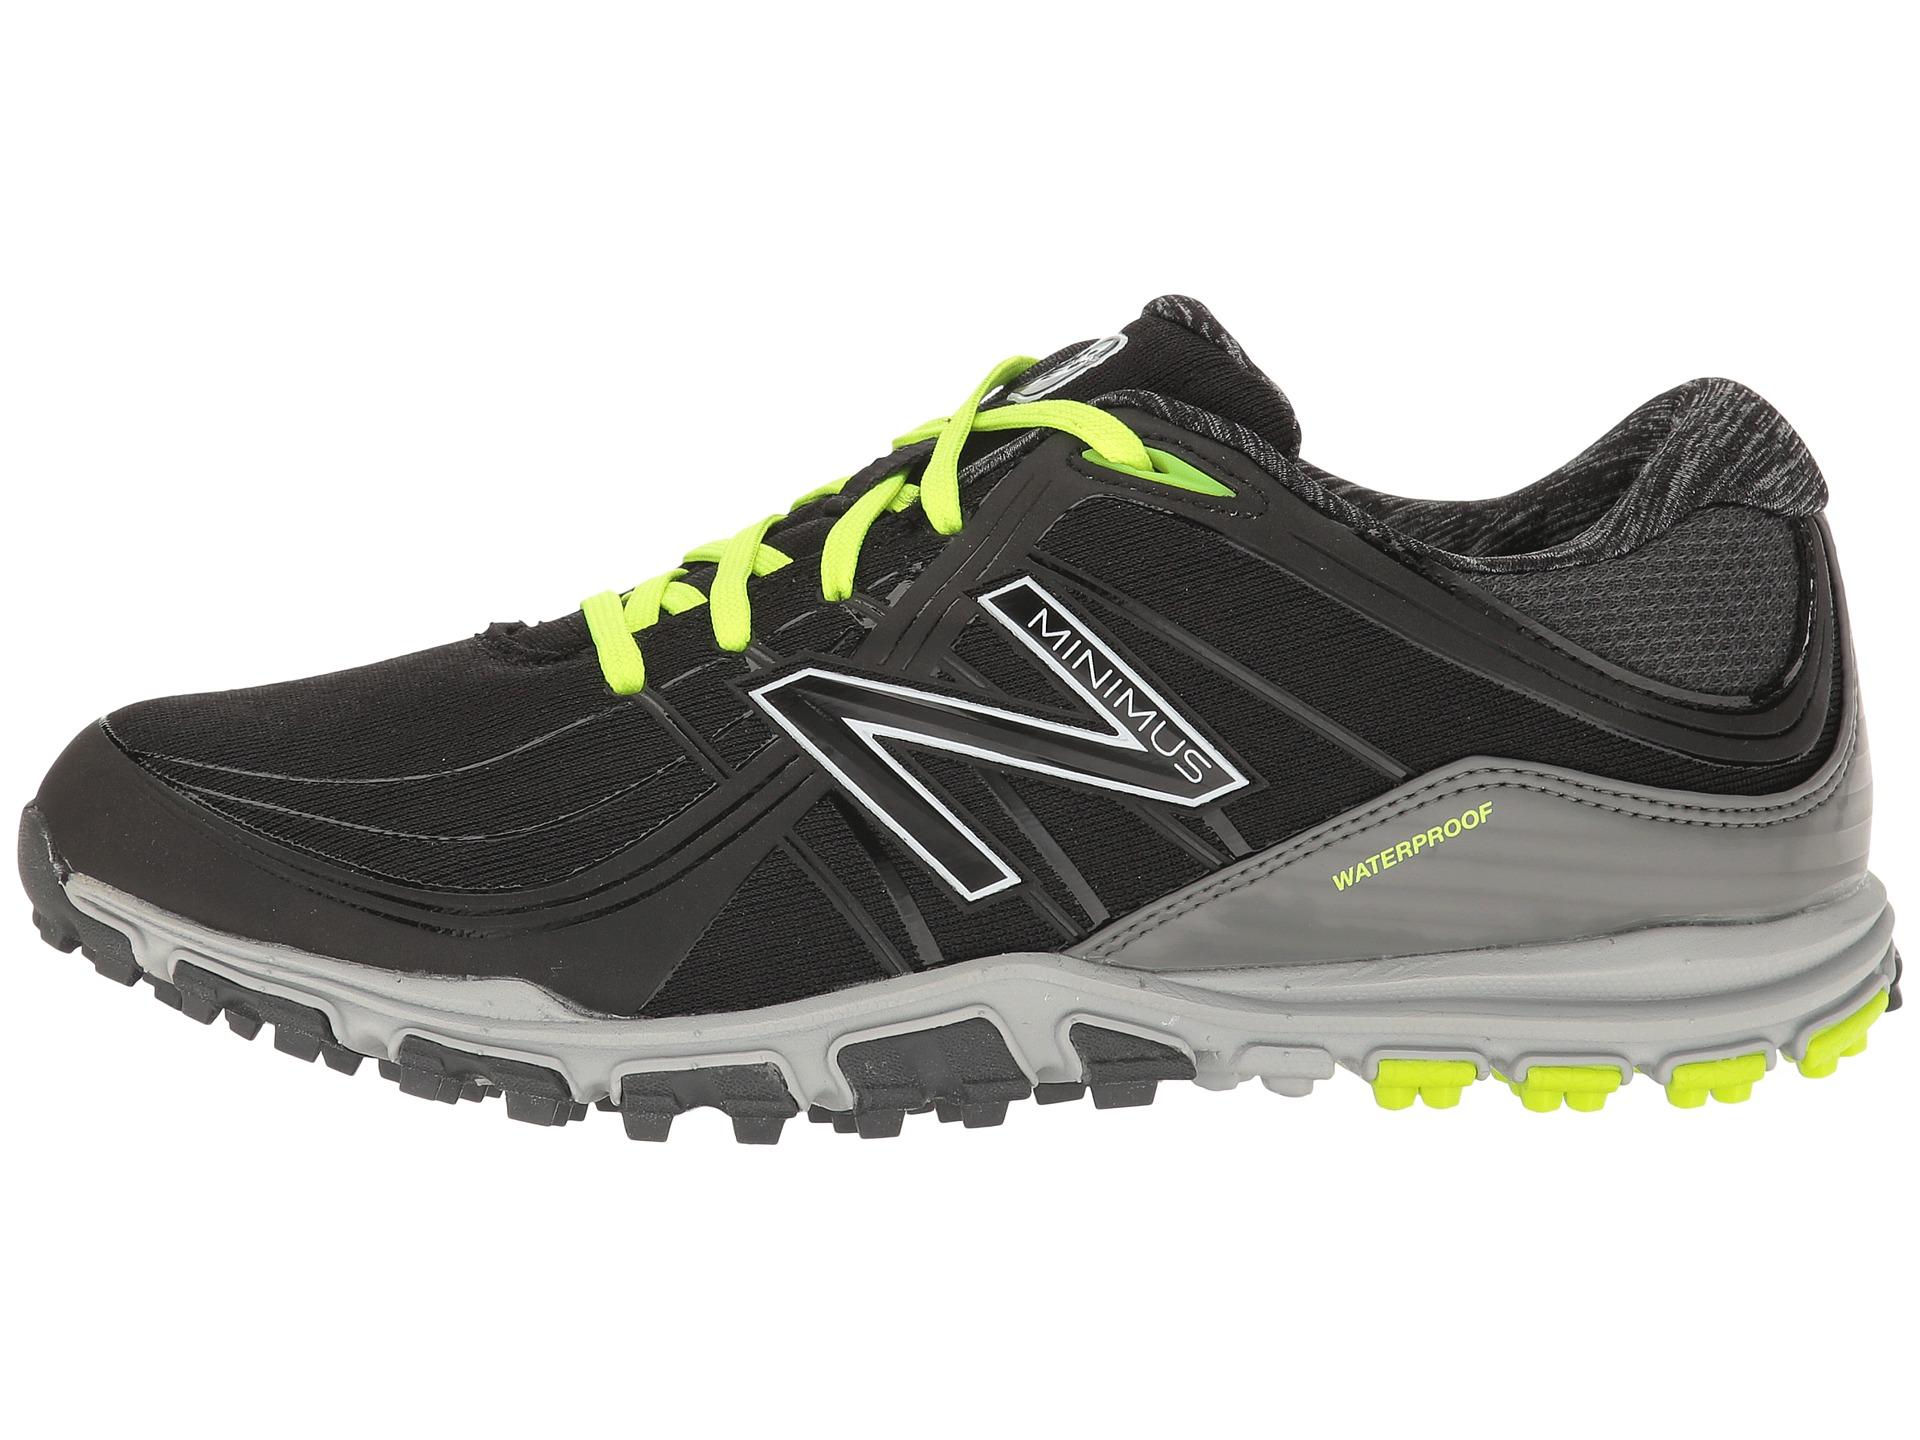 New Balance Minimus  Spikeless Golf Shoes Zappos